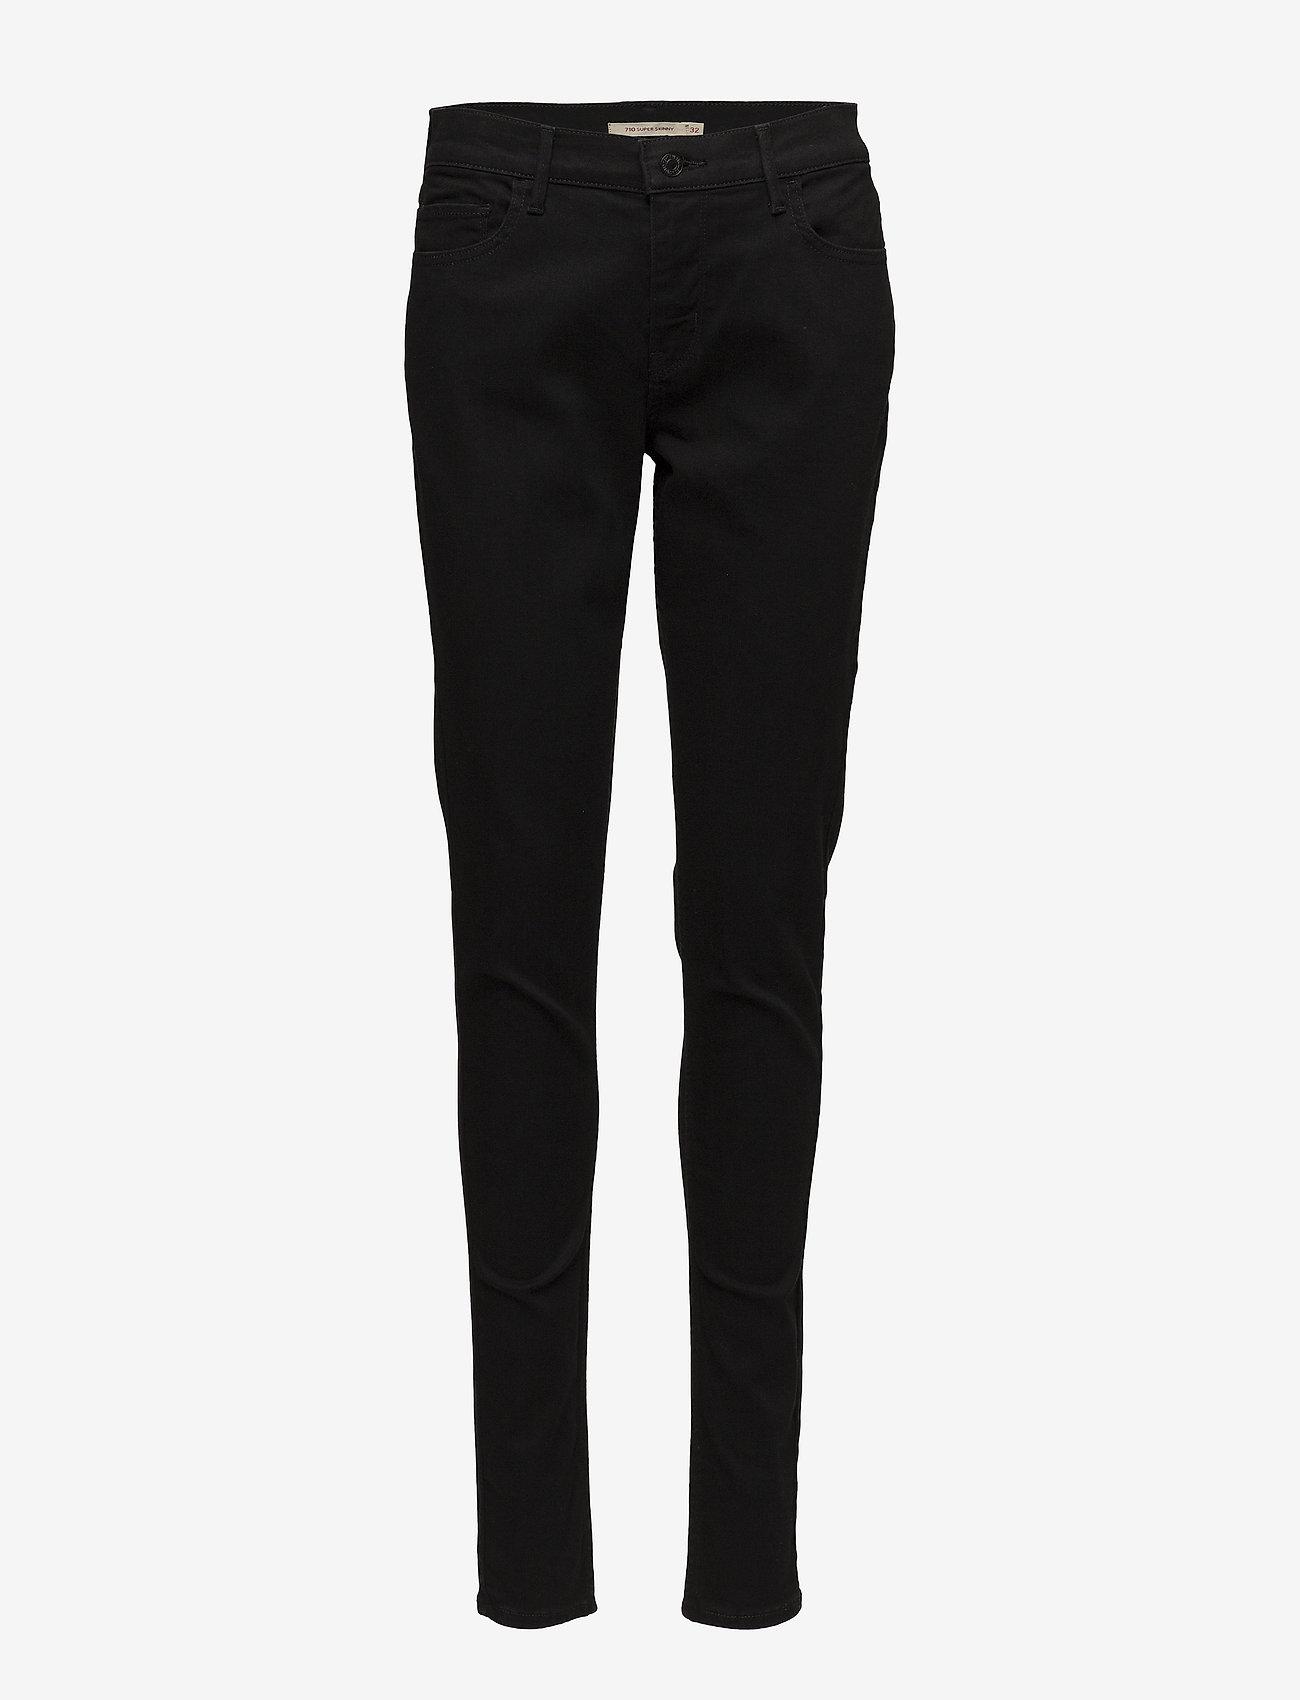 LEVI´S Women - INNOVATION SUPER SKINNY BLACK - skinny jeans - blacks - 0